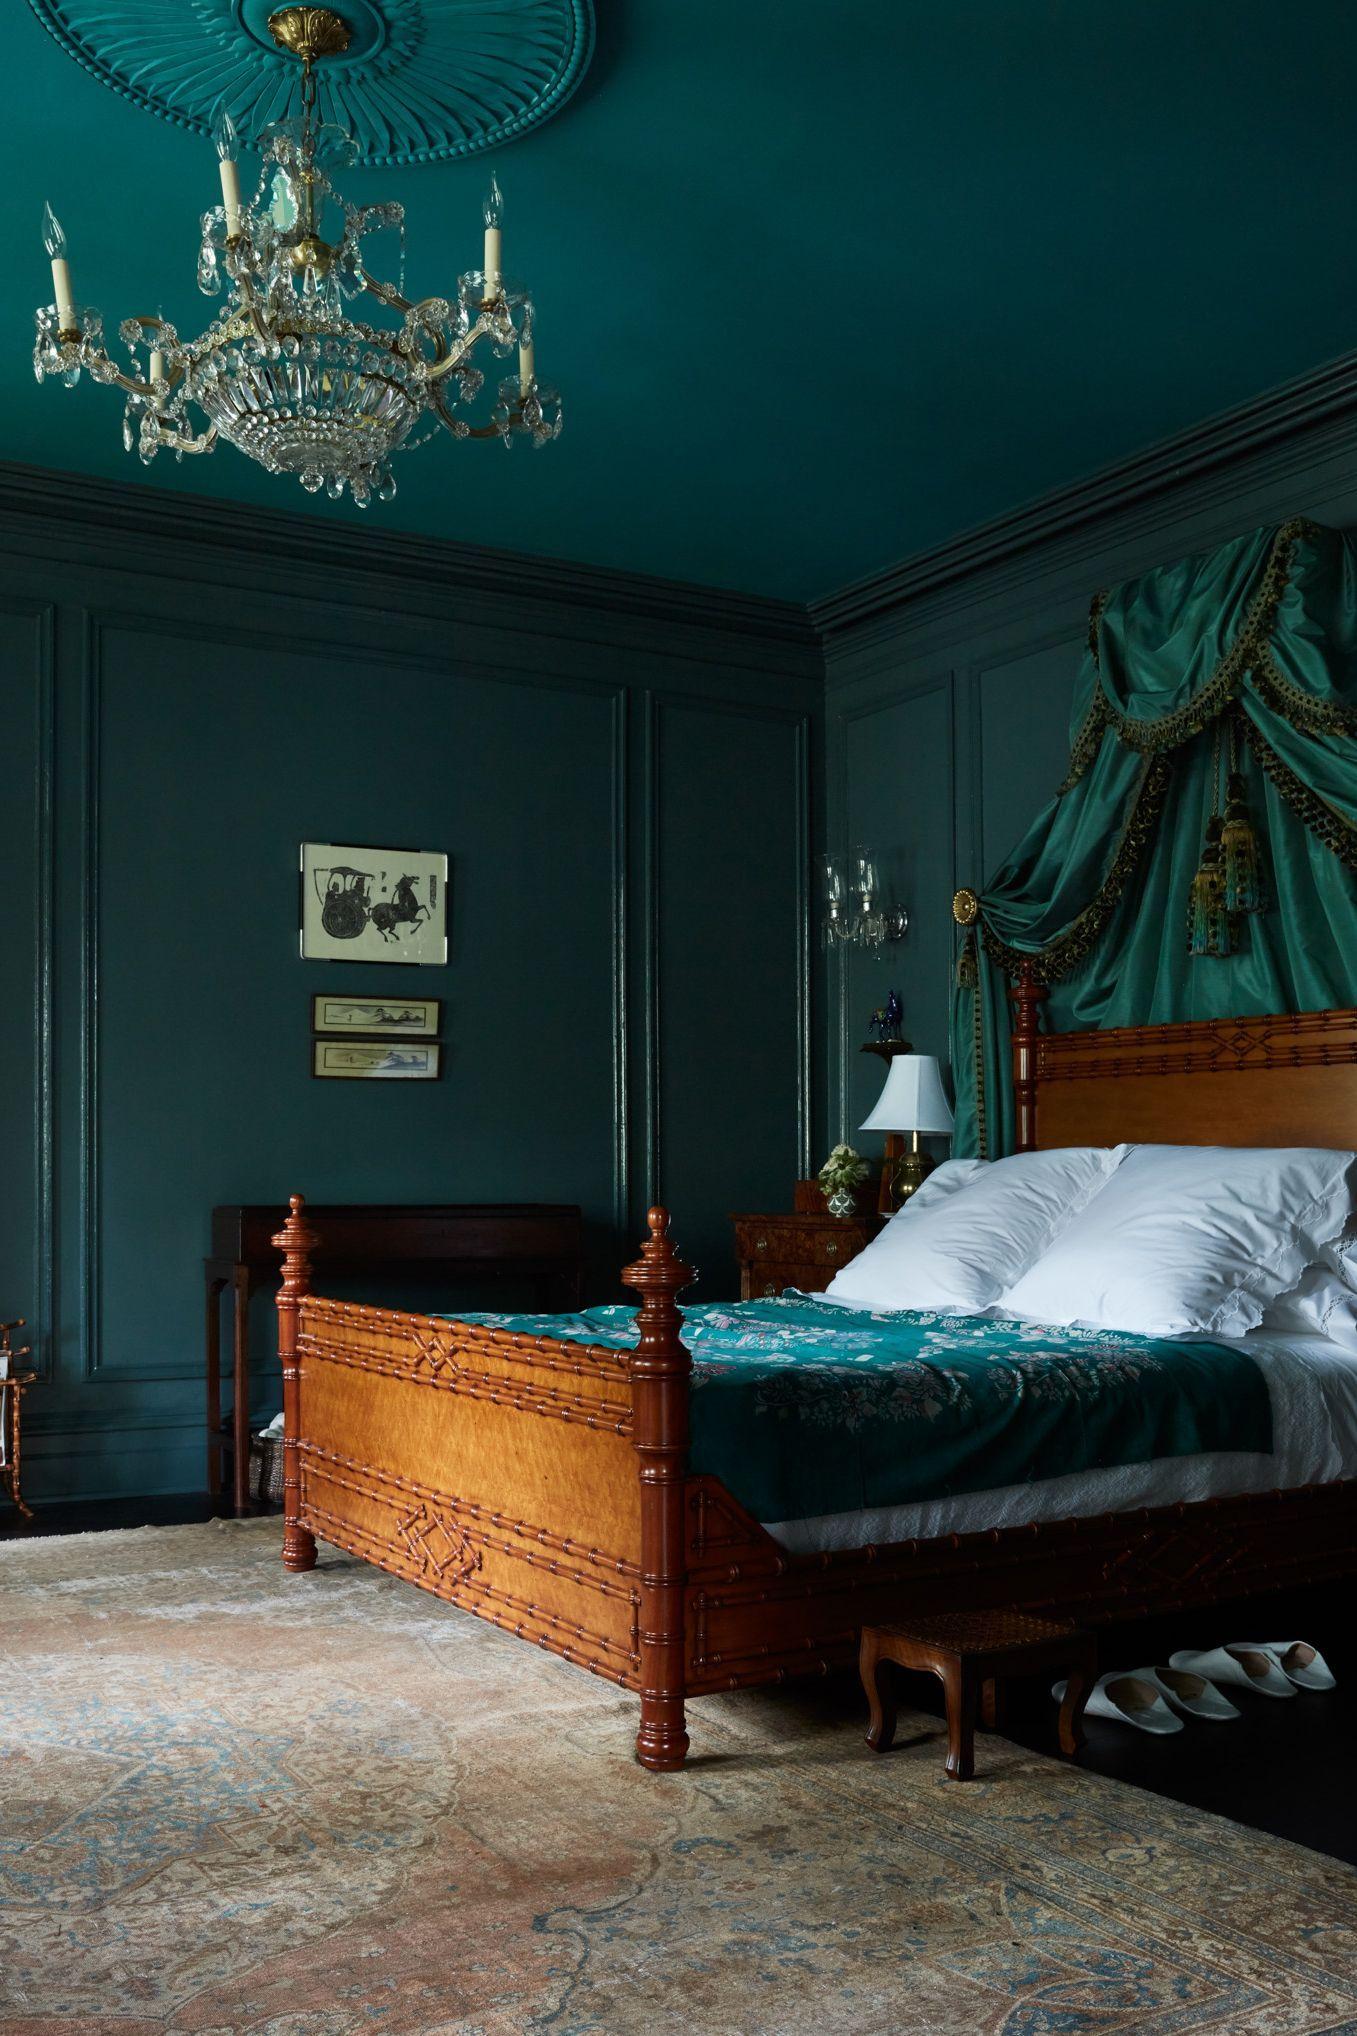 50+ Minimalist Bedroom Ideas Decoration Green bedroom